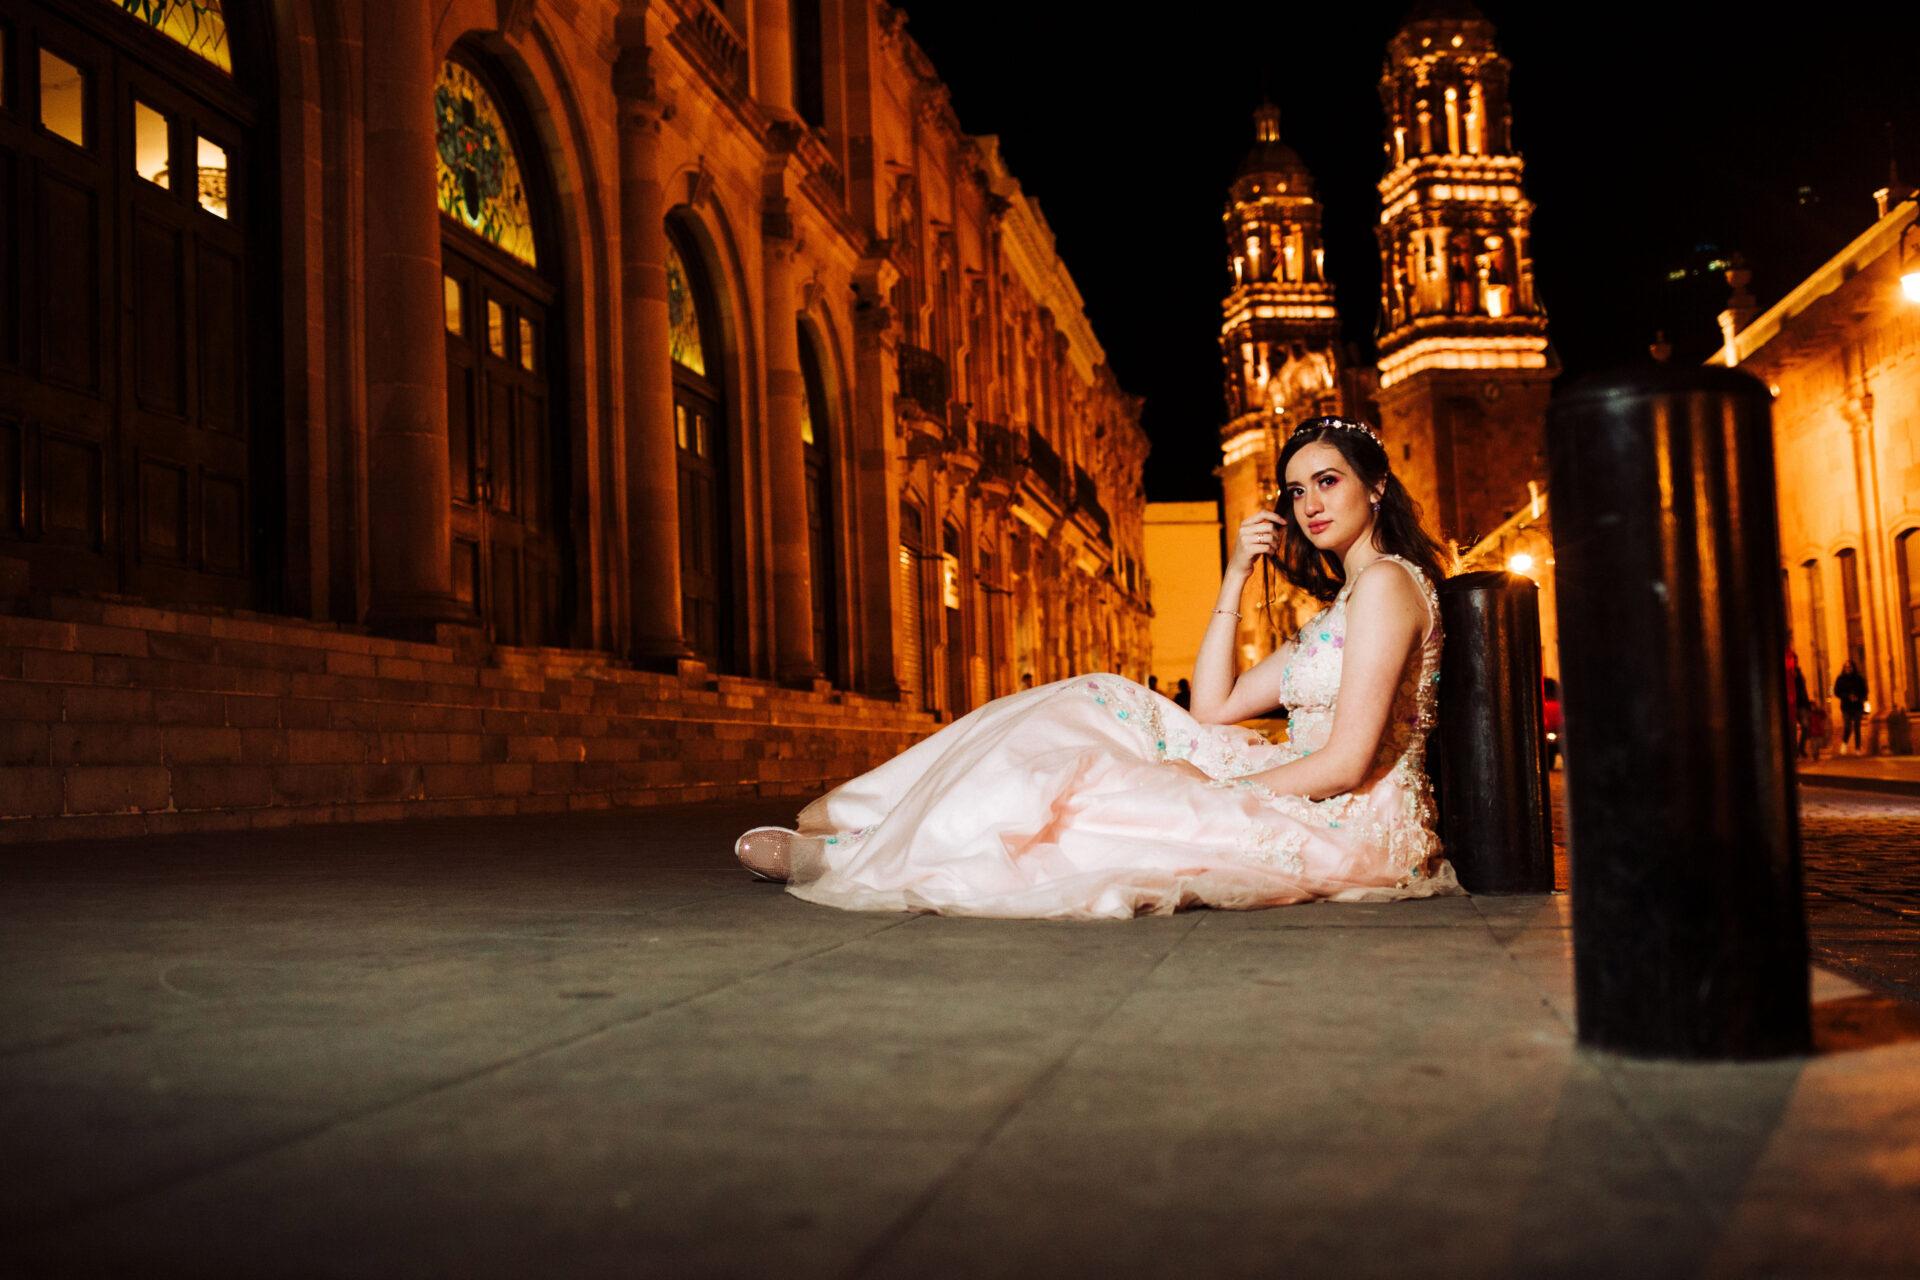 javier_noriega_fotografo_bodas_zacatecas_trash_the_dress_xv_años00009